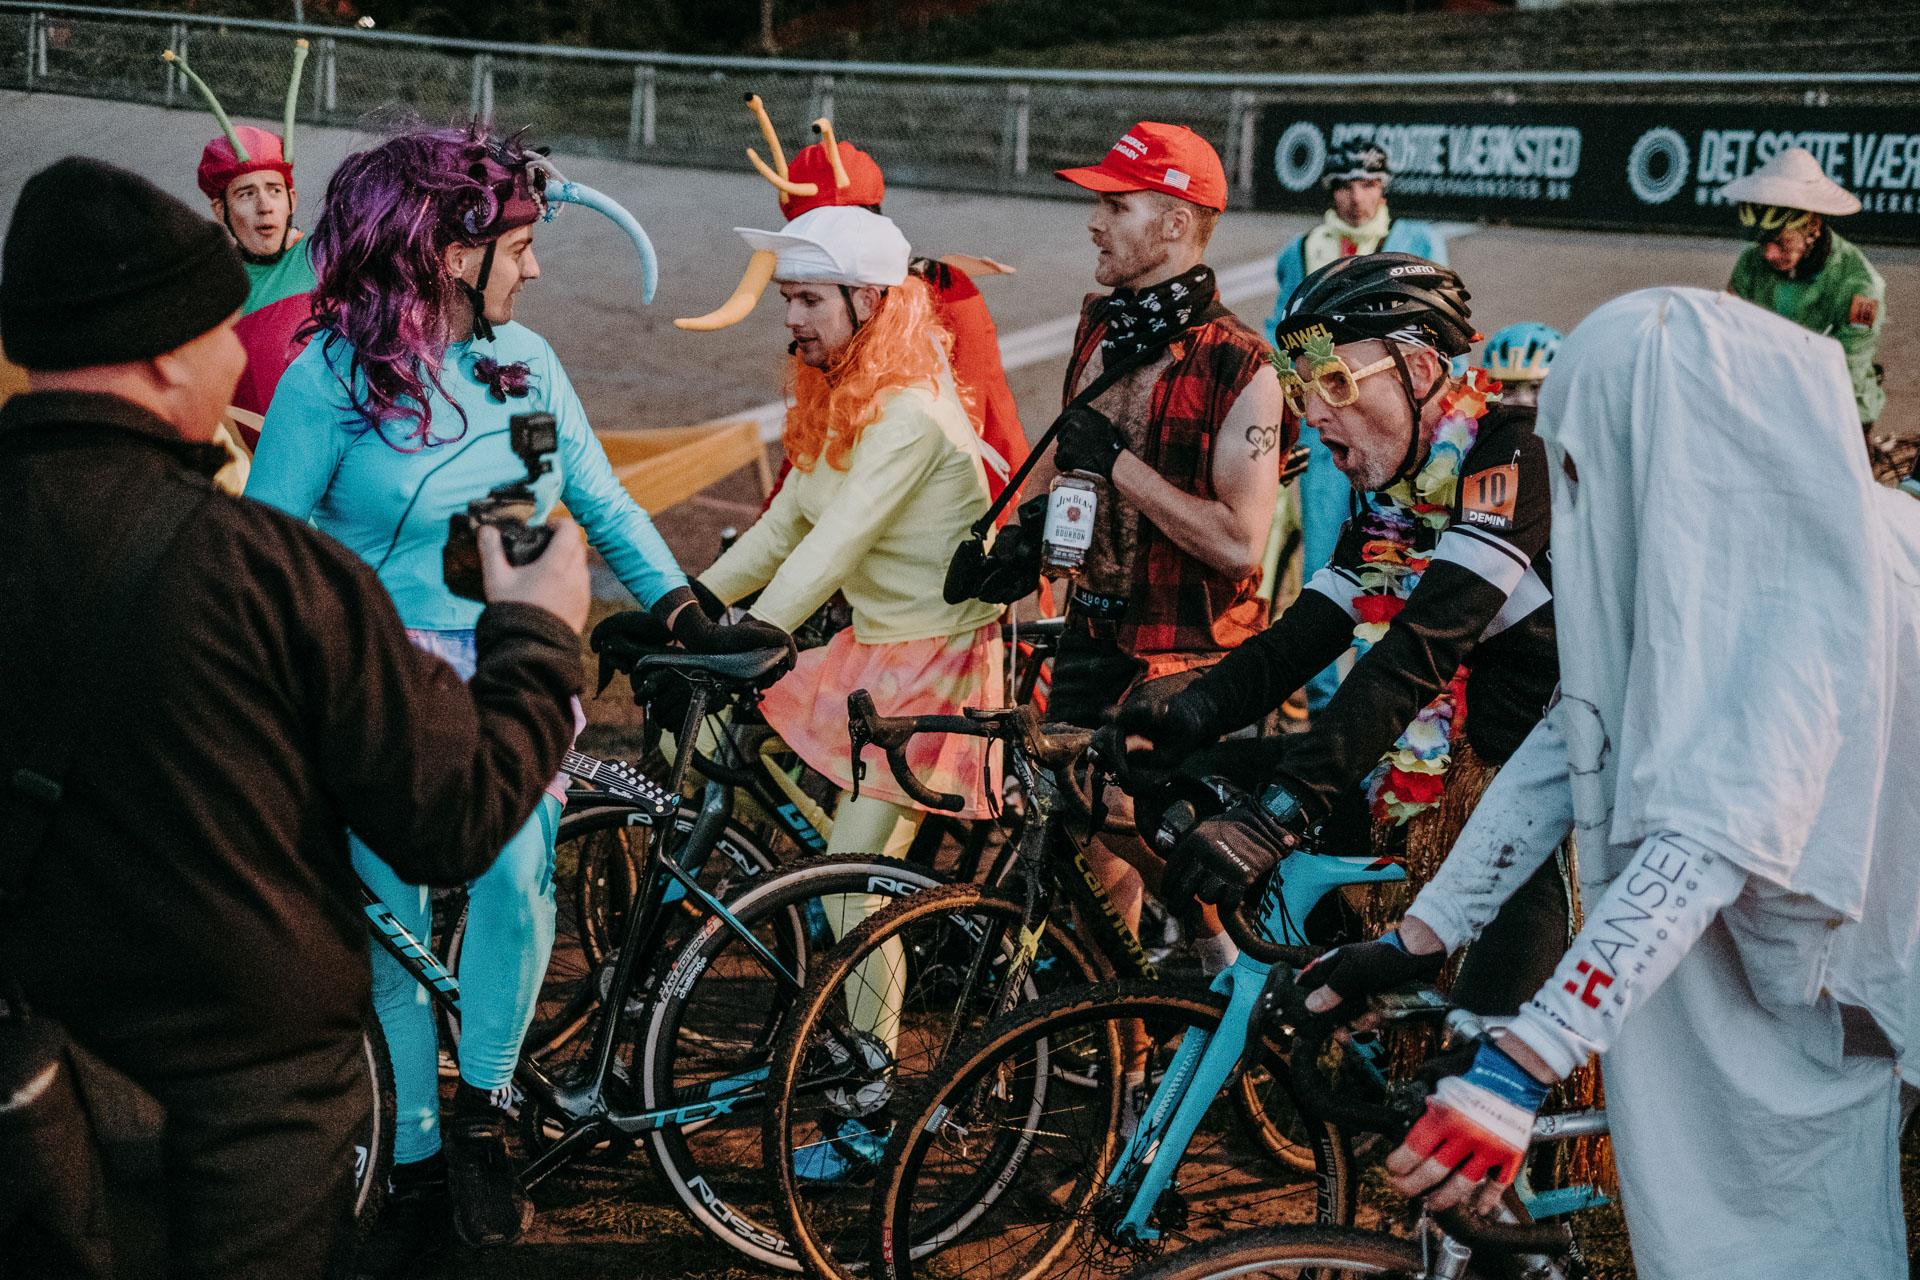 Aarhus Cyklebane: HalloweenCross - Grote Prijs CK Aarhus vol. XIII + XIV